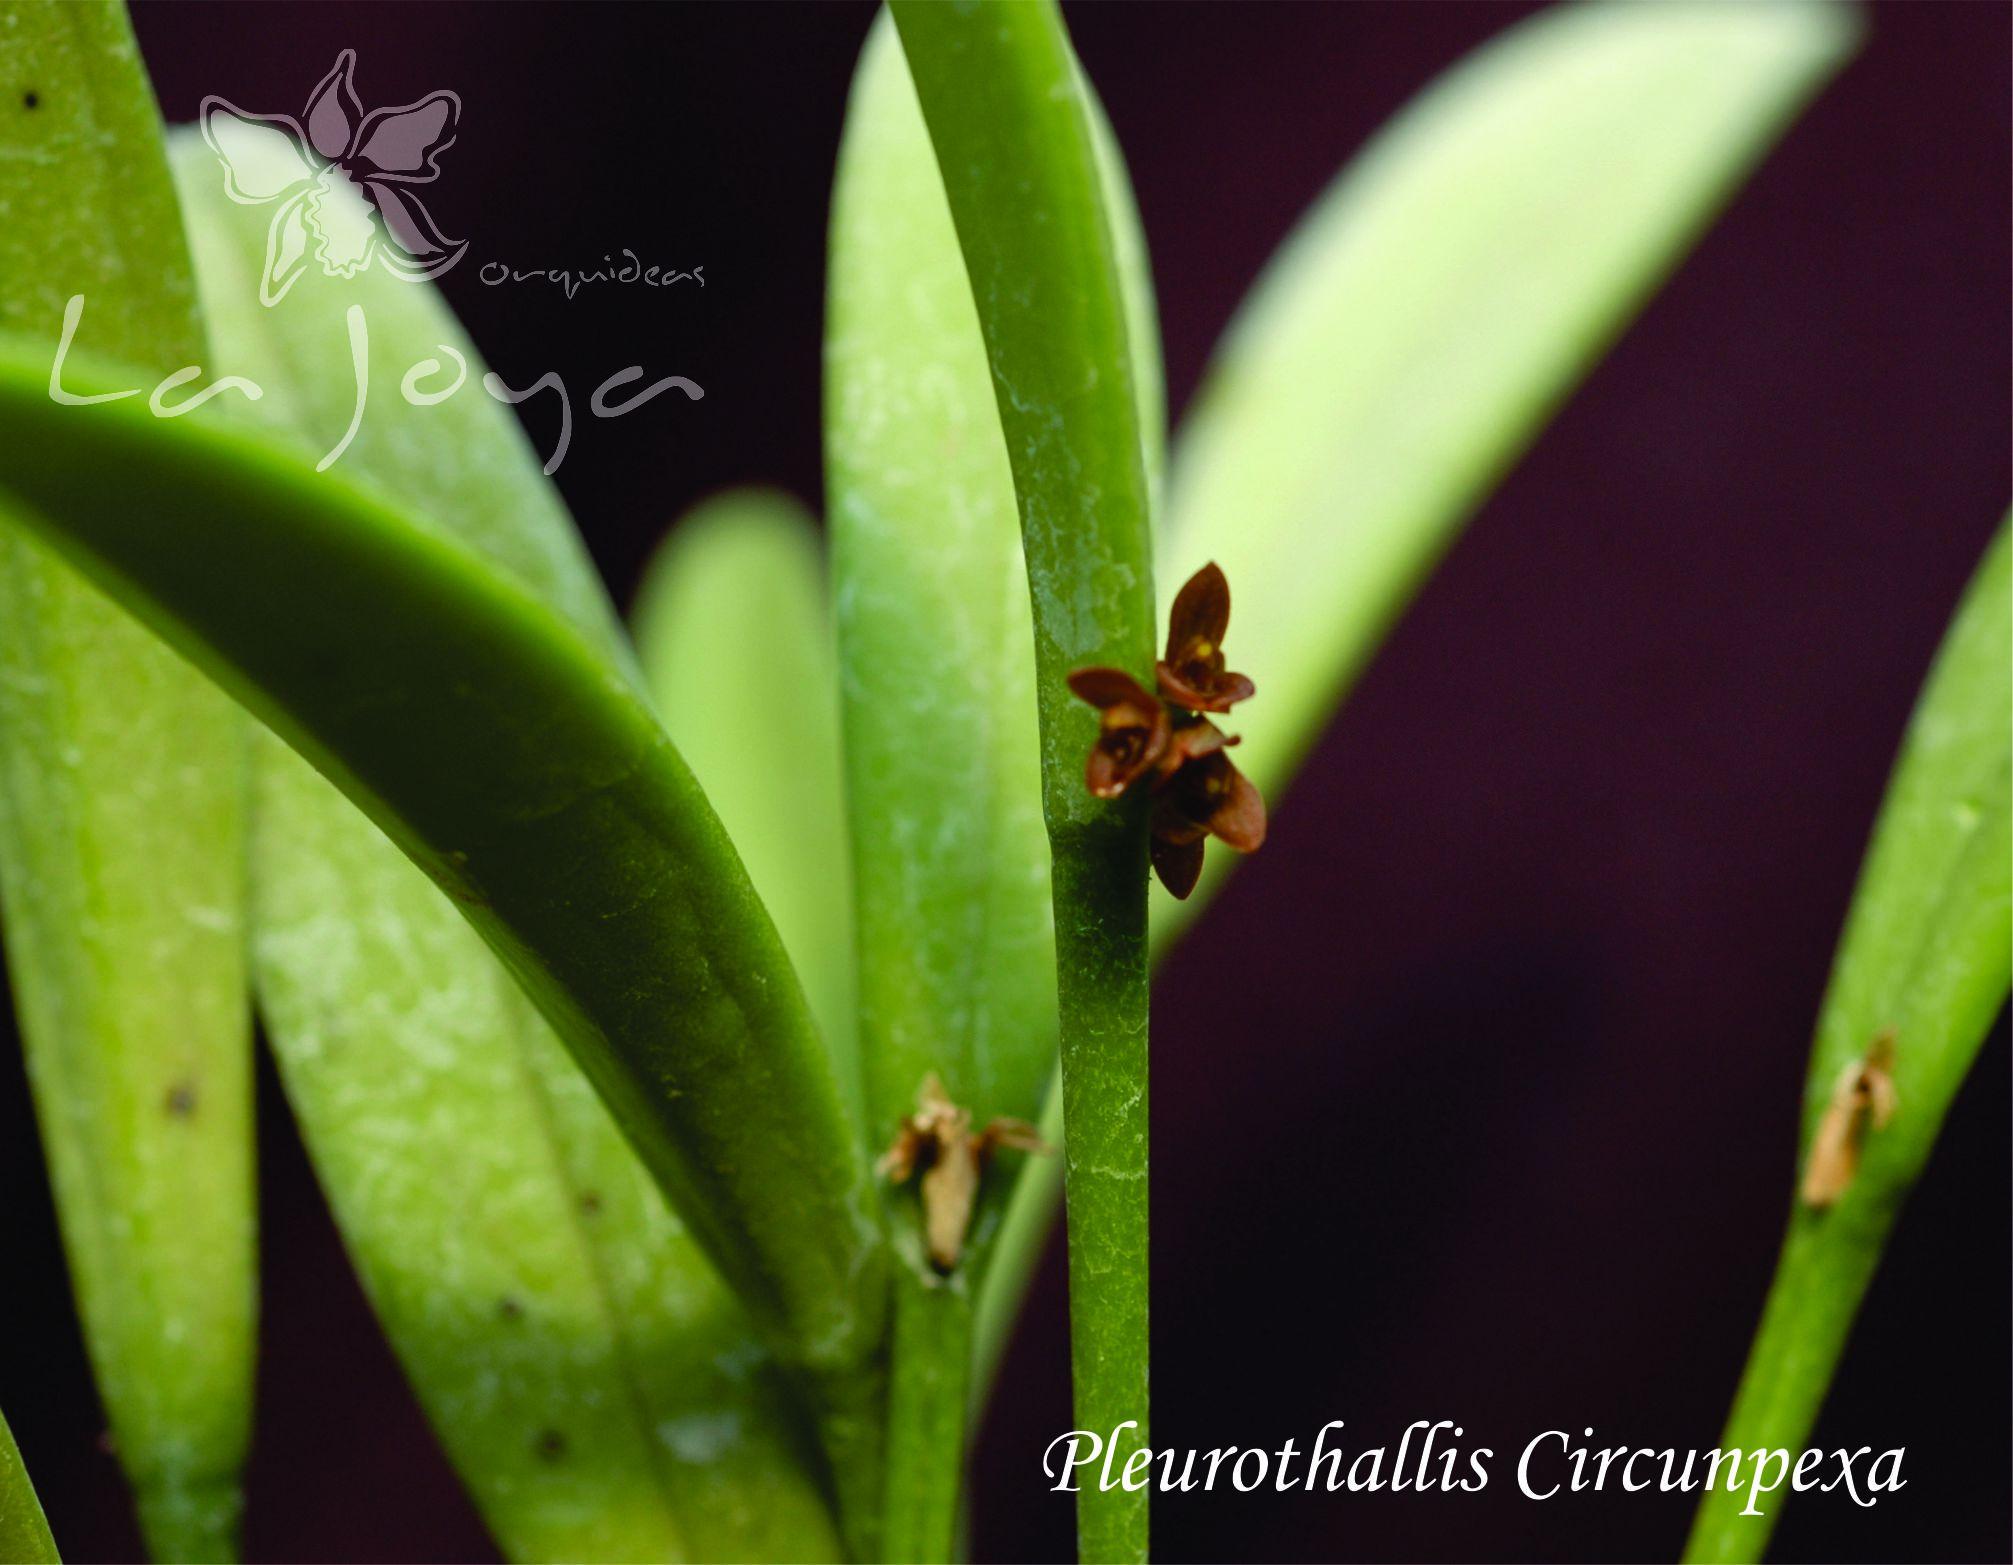 Pleurothallis Circunpexa